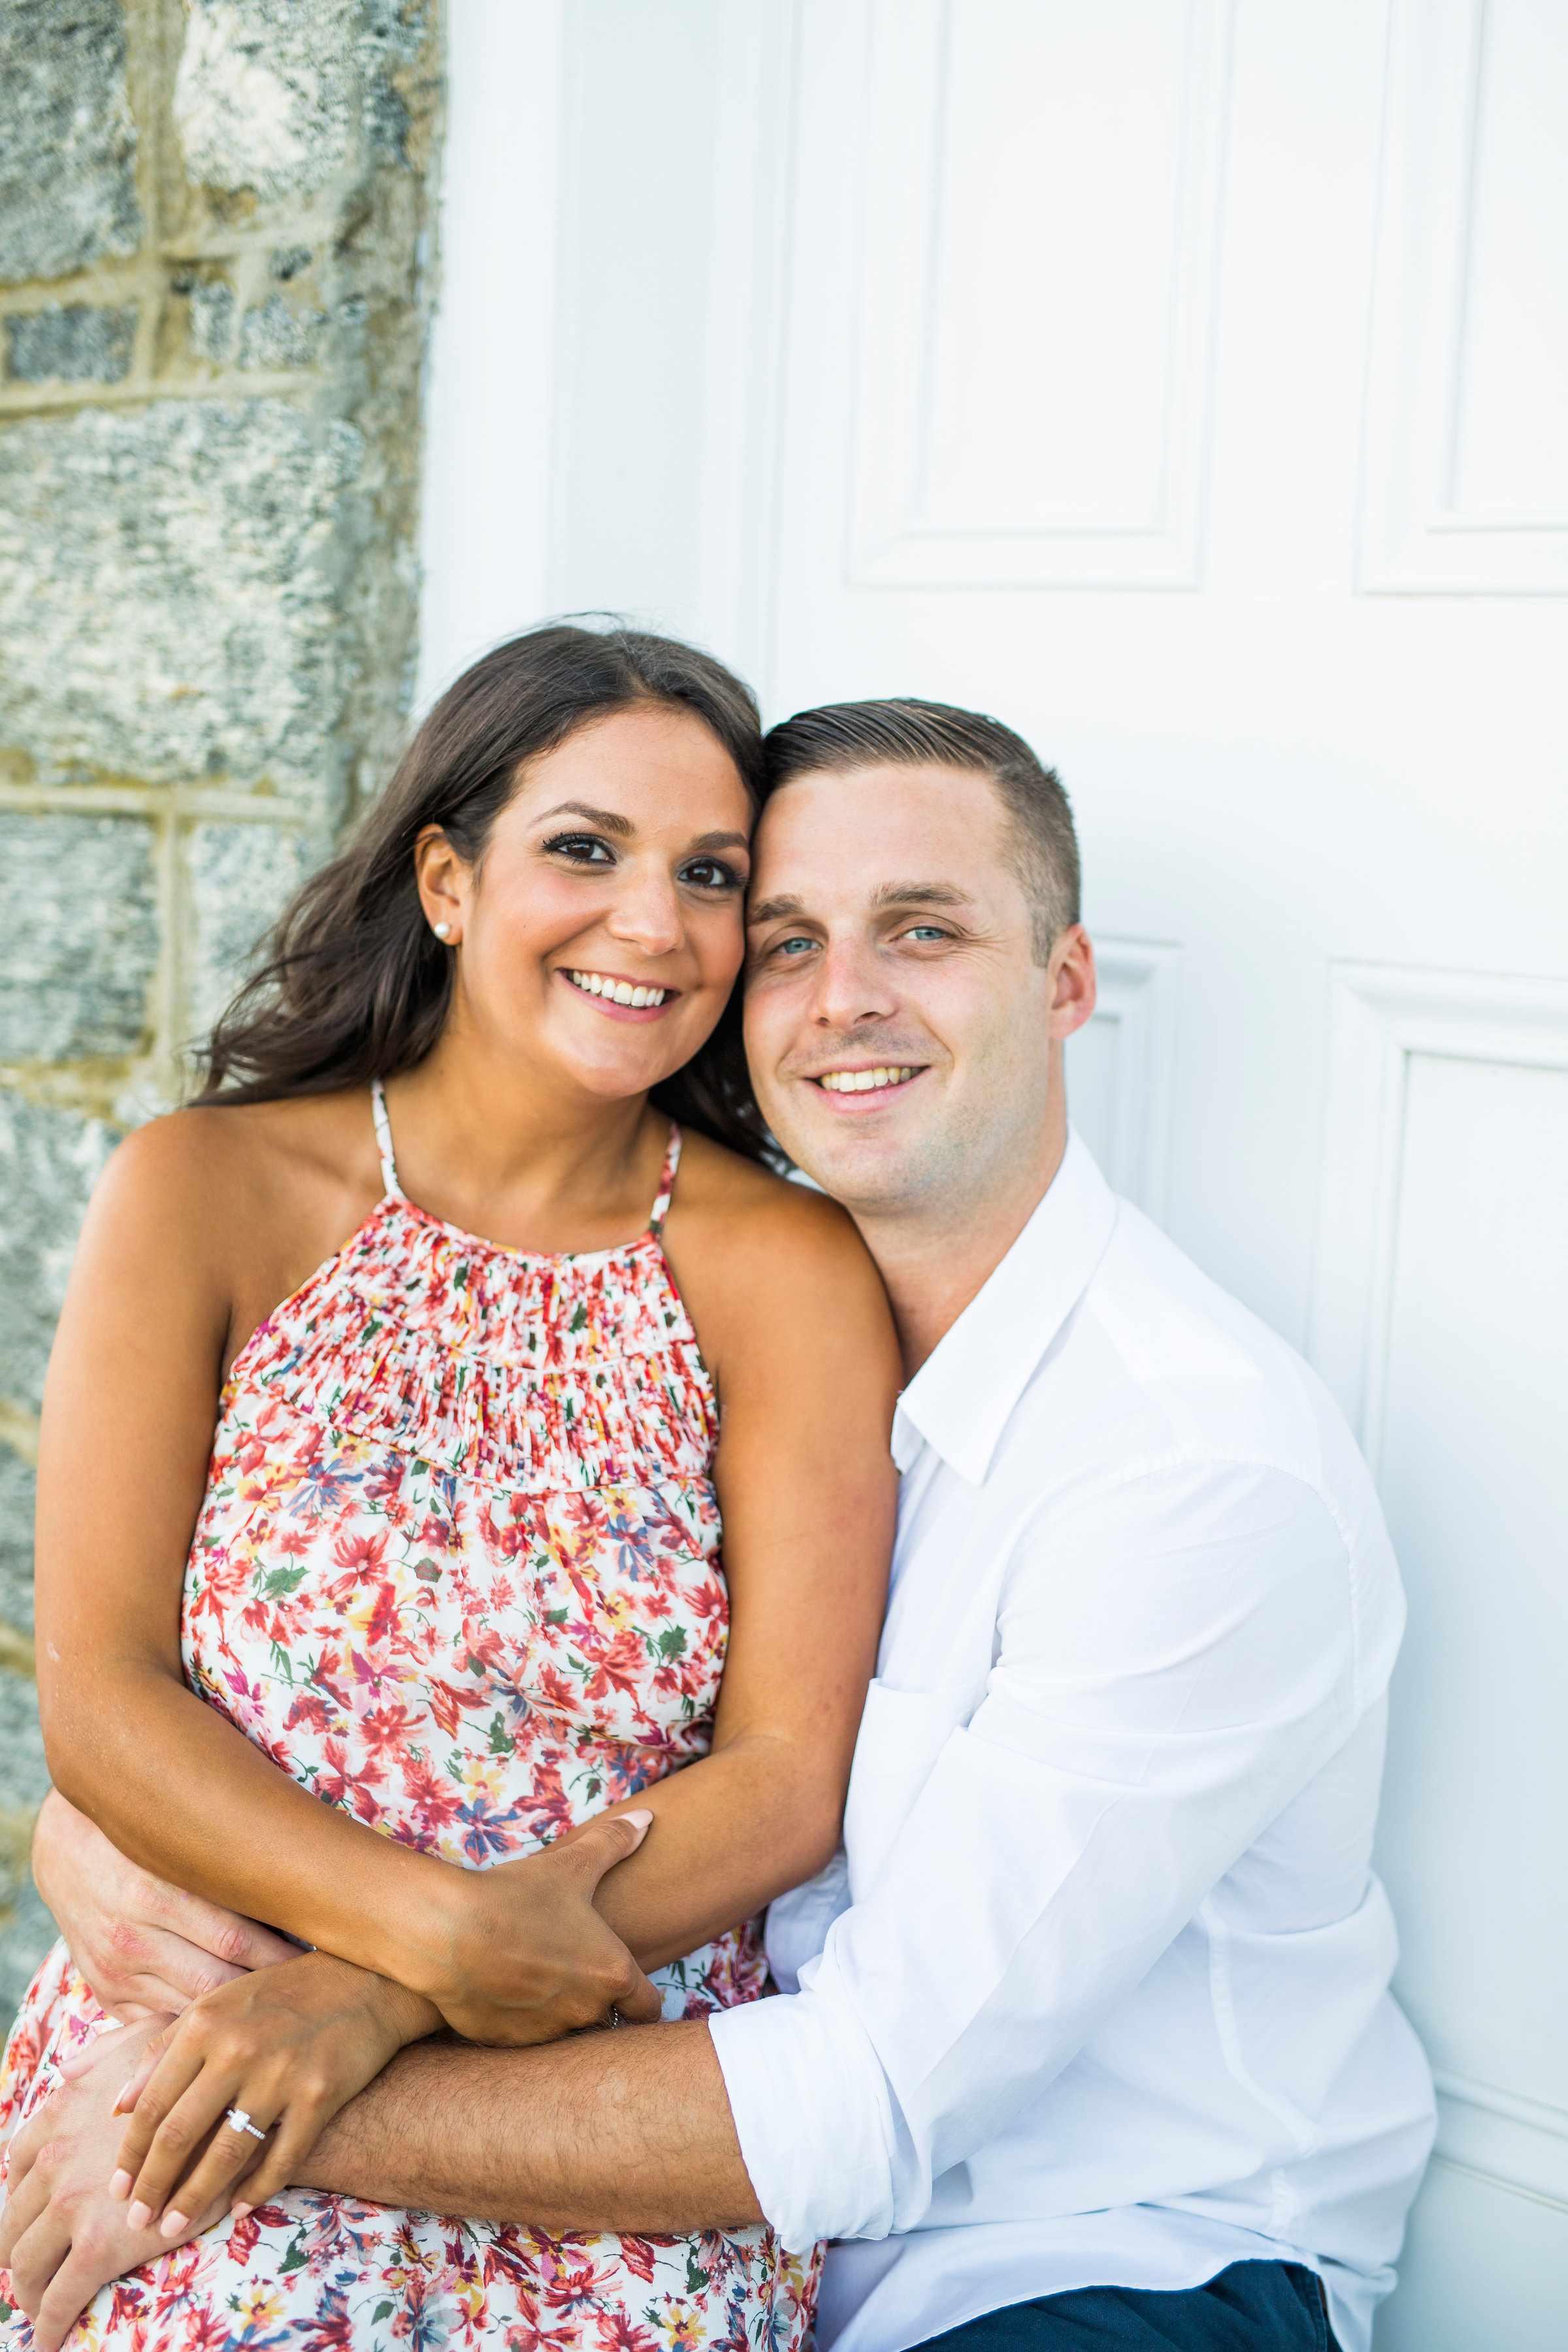 brittney rutigliano & eric peterson's wedding registry